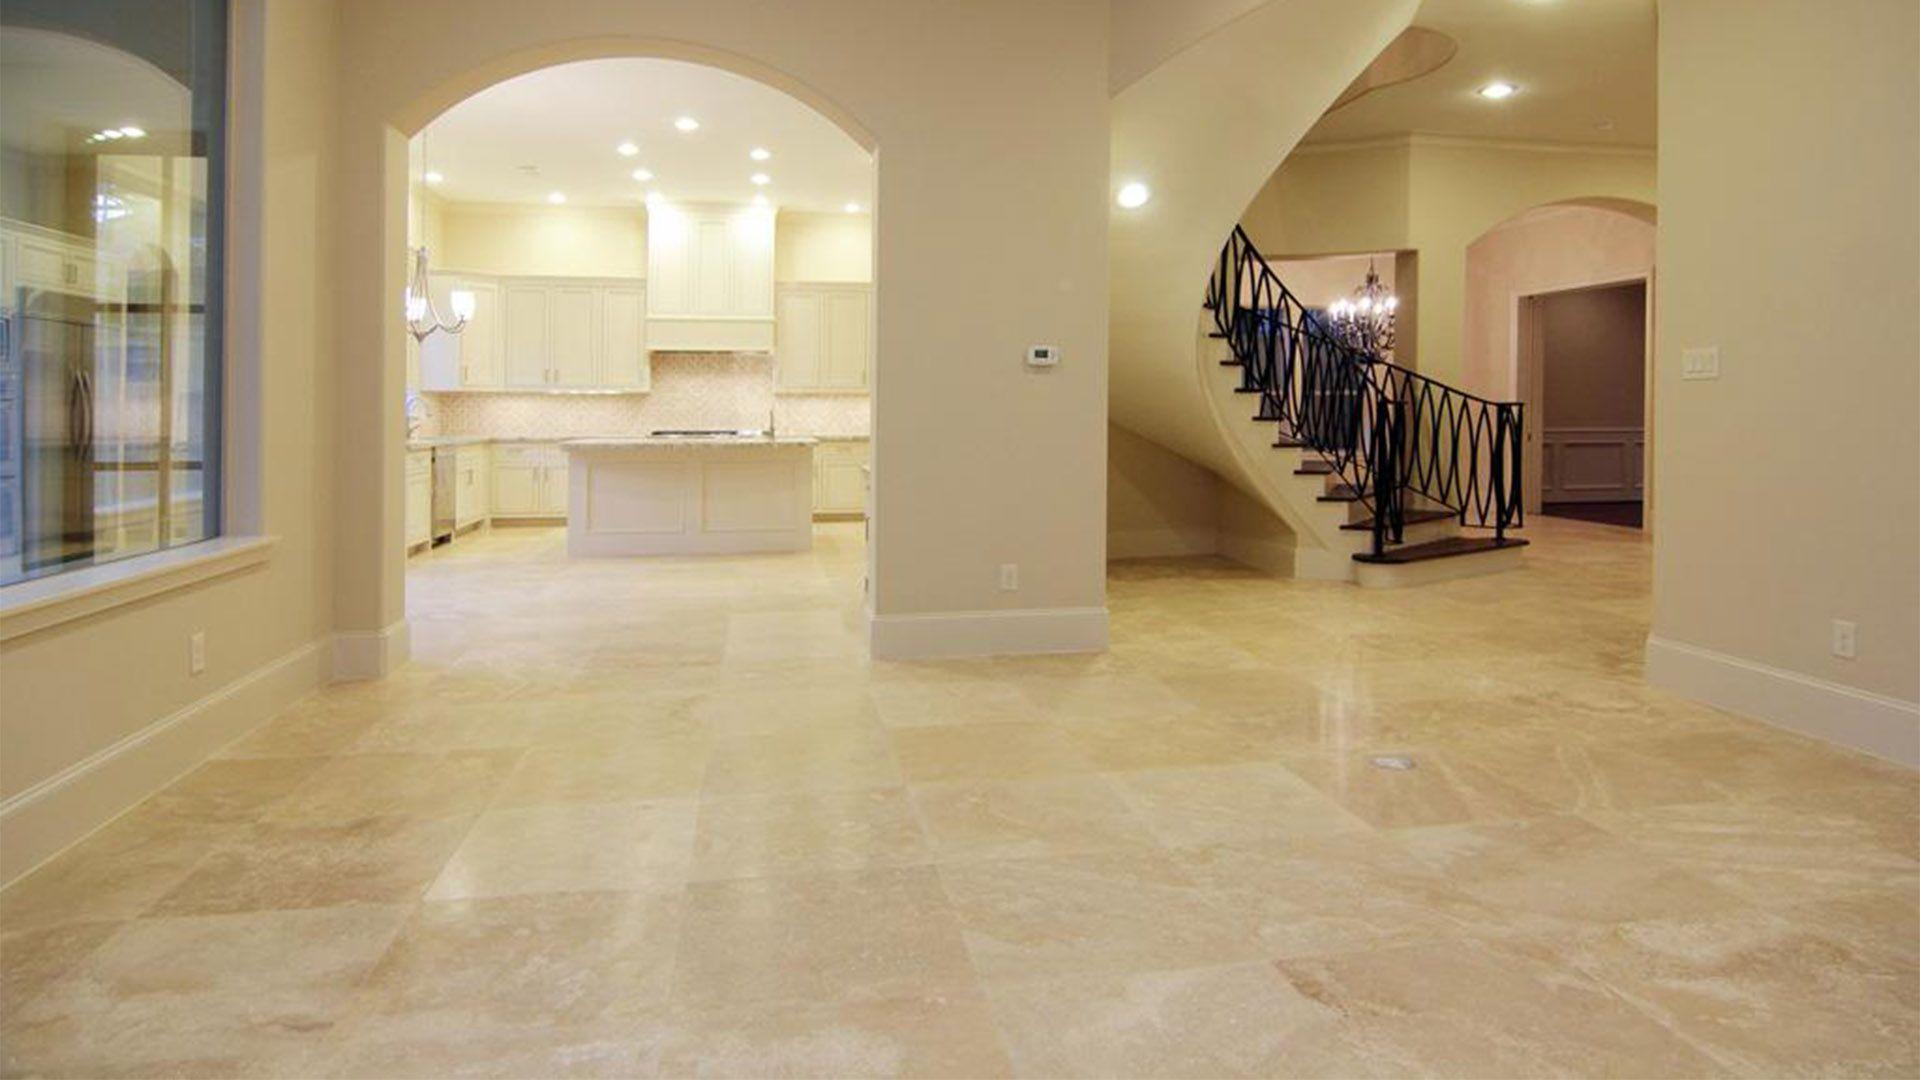 Stone Marble Granite Shine Homedesign Design Bathroomdesign Home Interior